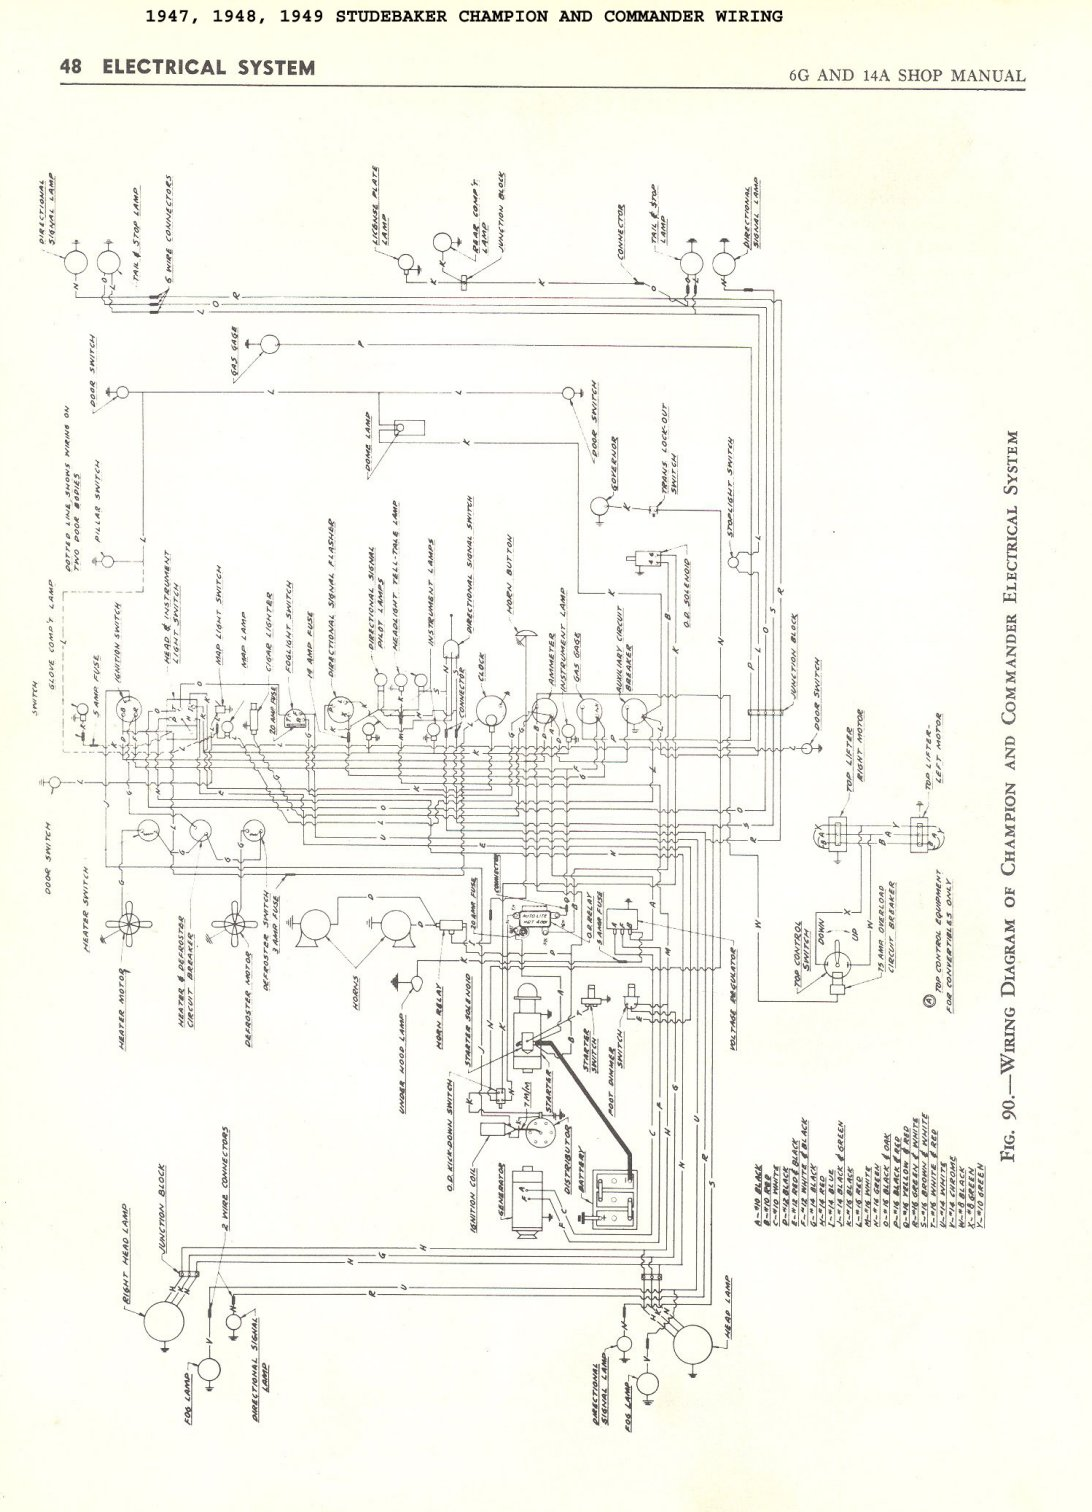 studebaker wiring diagrams. Black Bedroom Furniture Sets. Home Design Ideas